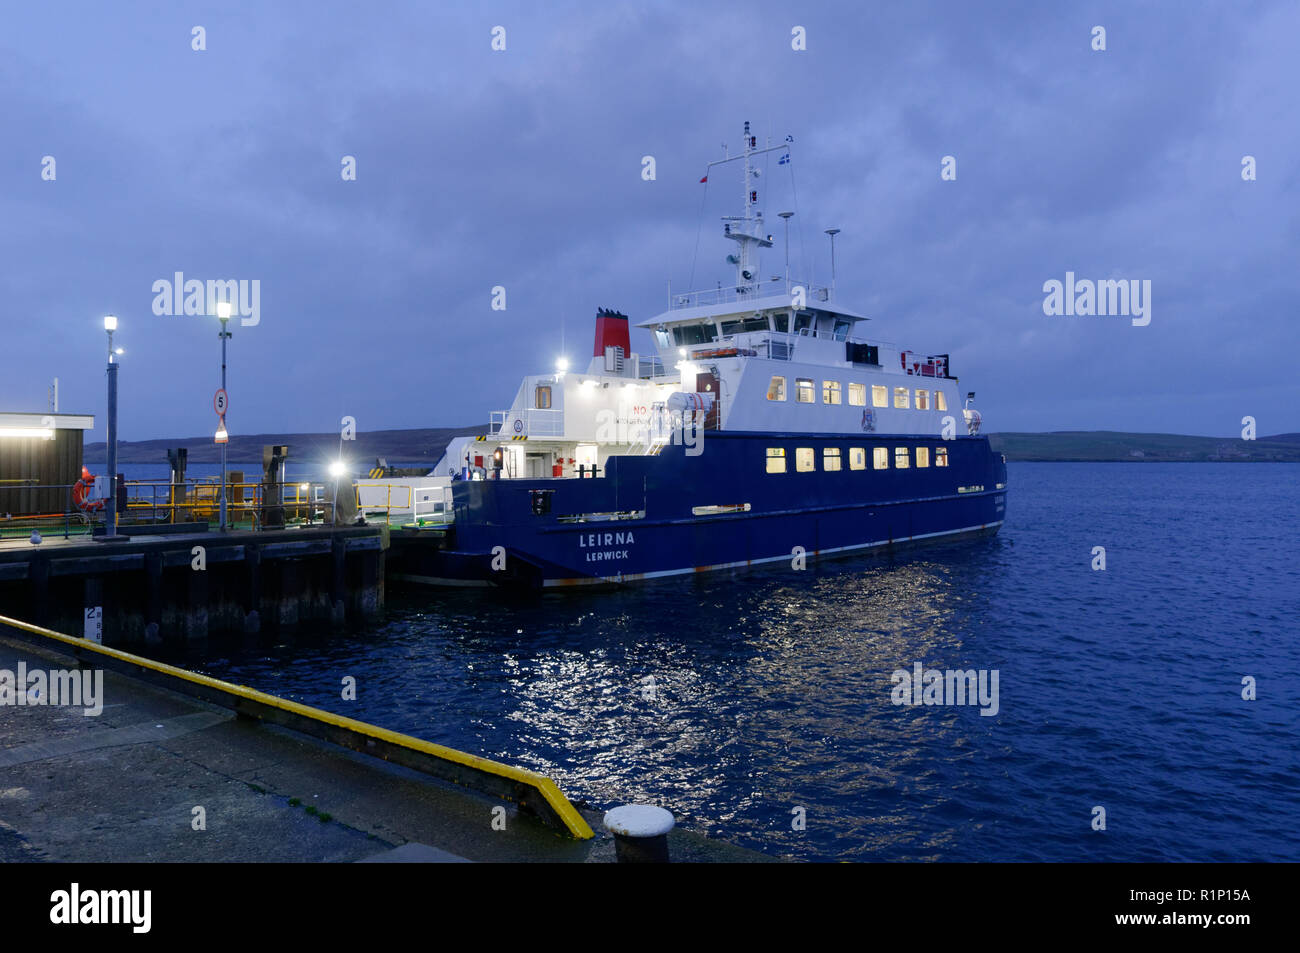 Roro Ferry Stock Photos & Roro Ferry Stock Images - Alamy